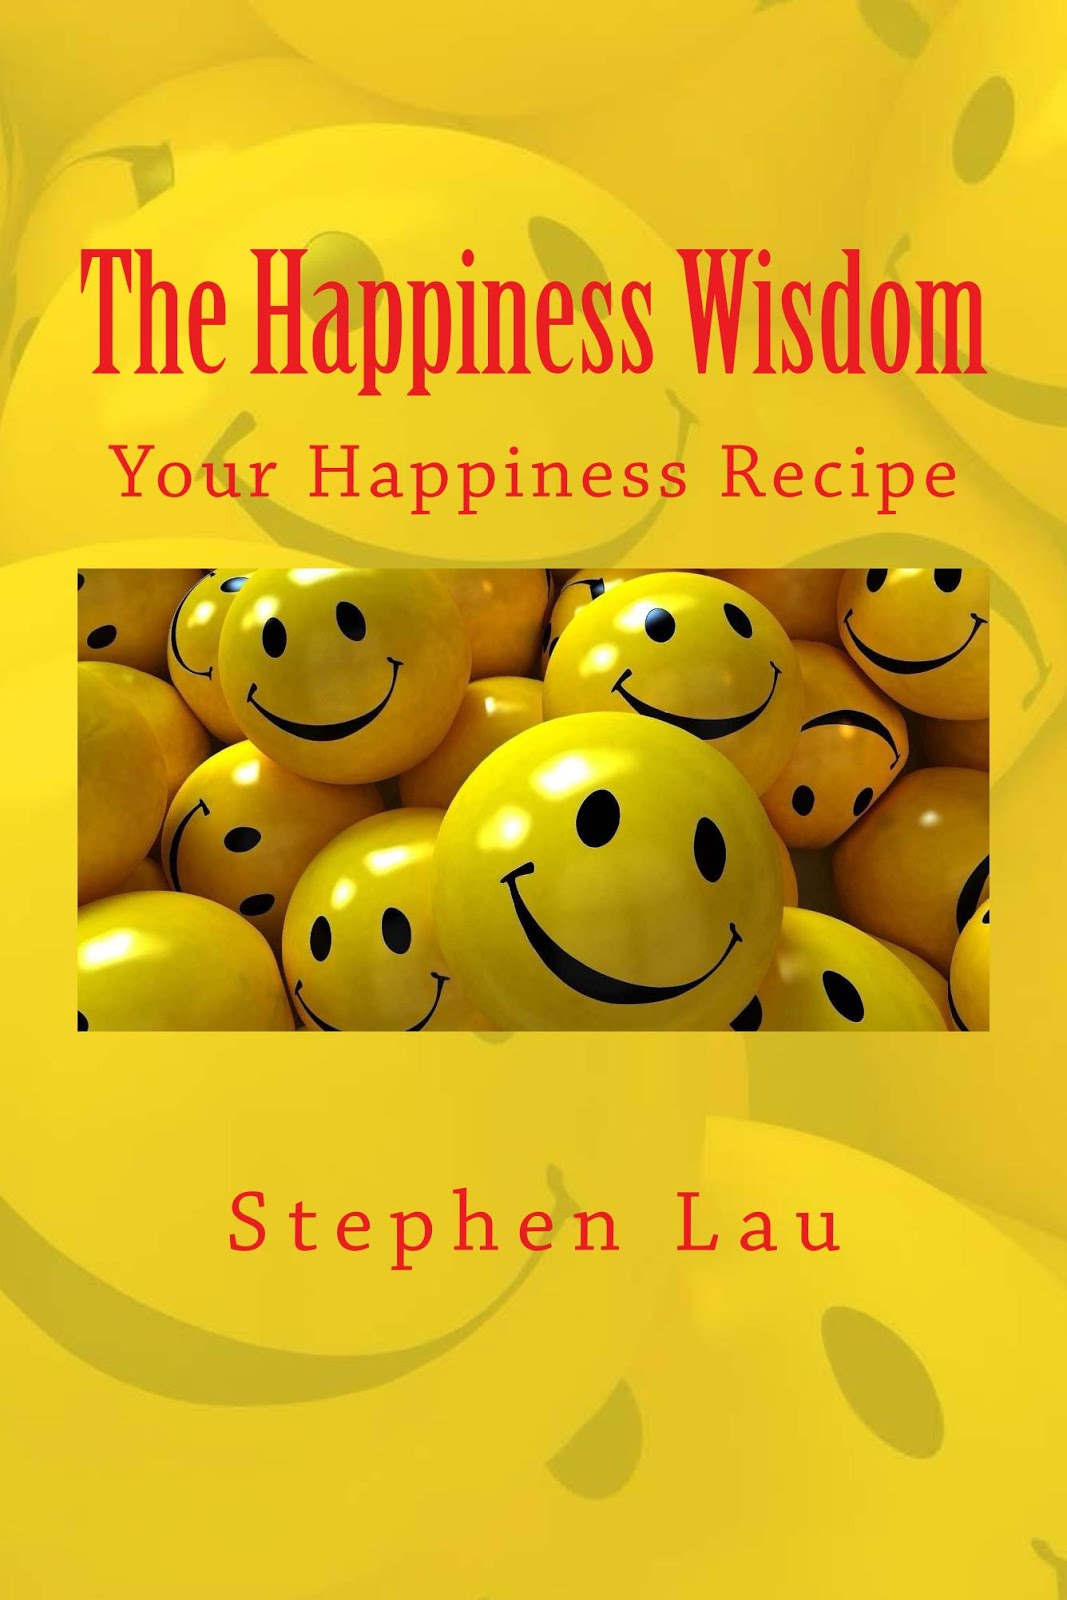 <b>The Happiness Wisdom</b>